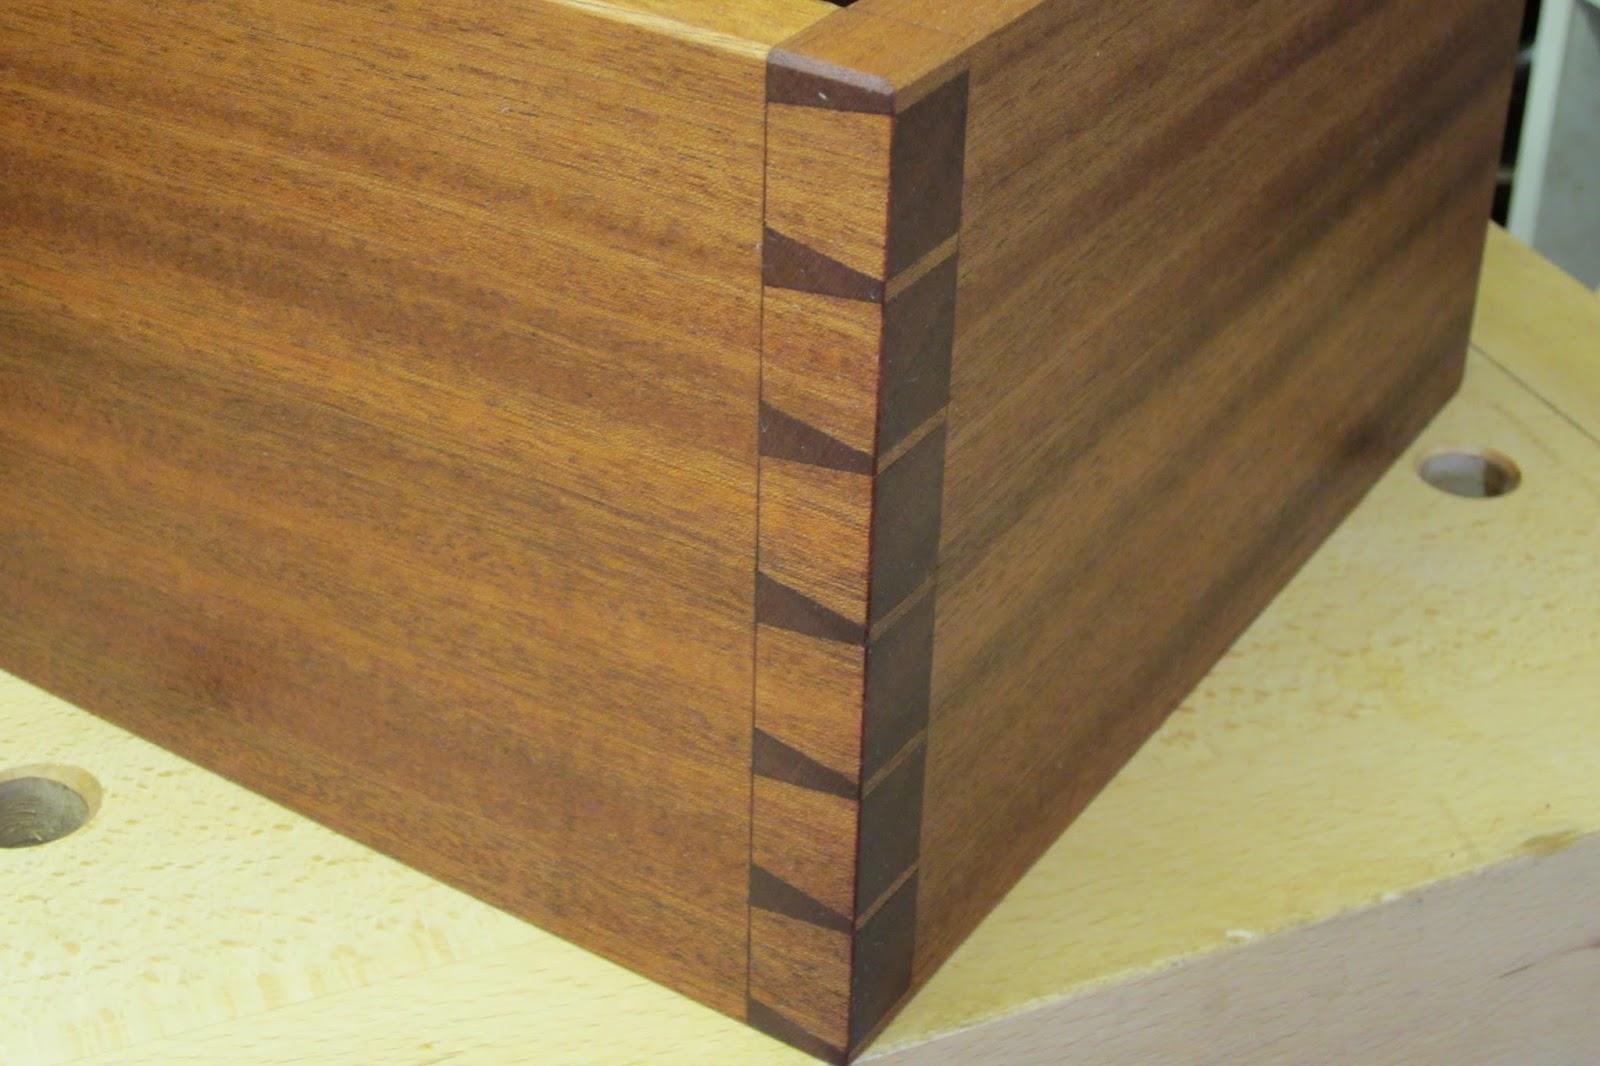 David barron furniture dovetail alignment boards for Dovetail furniture